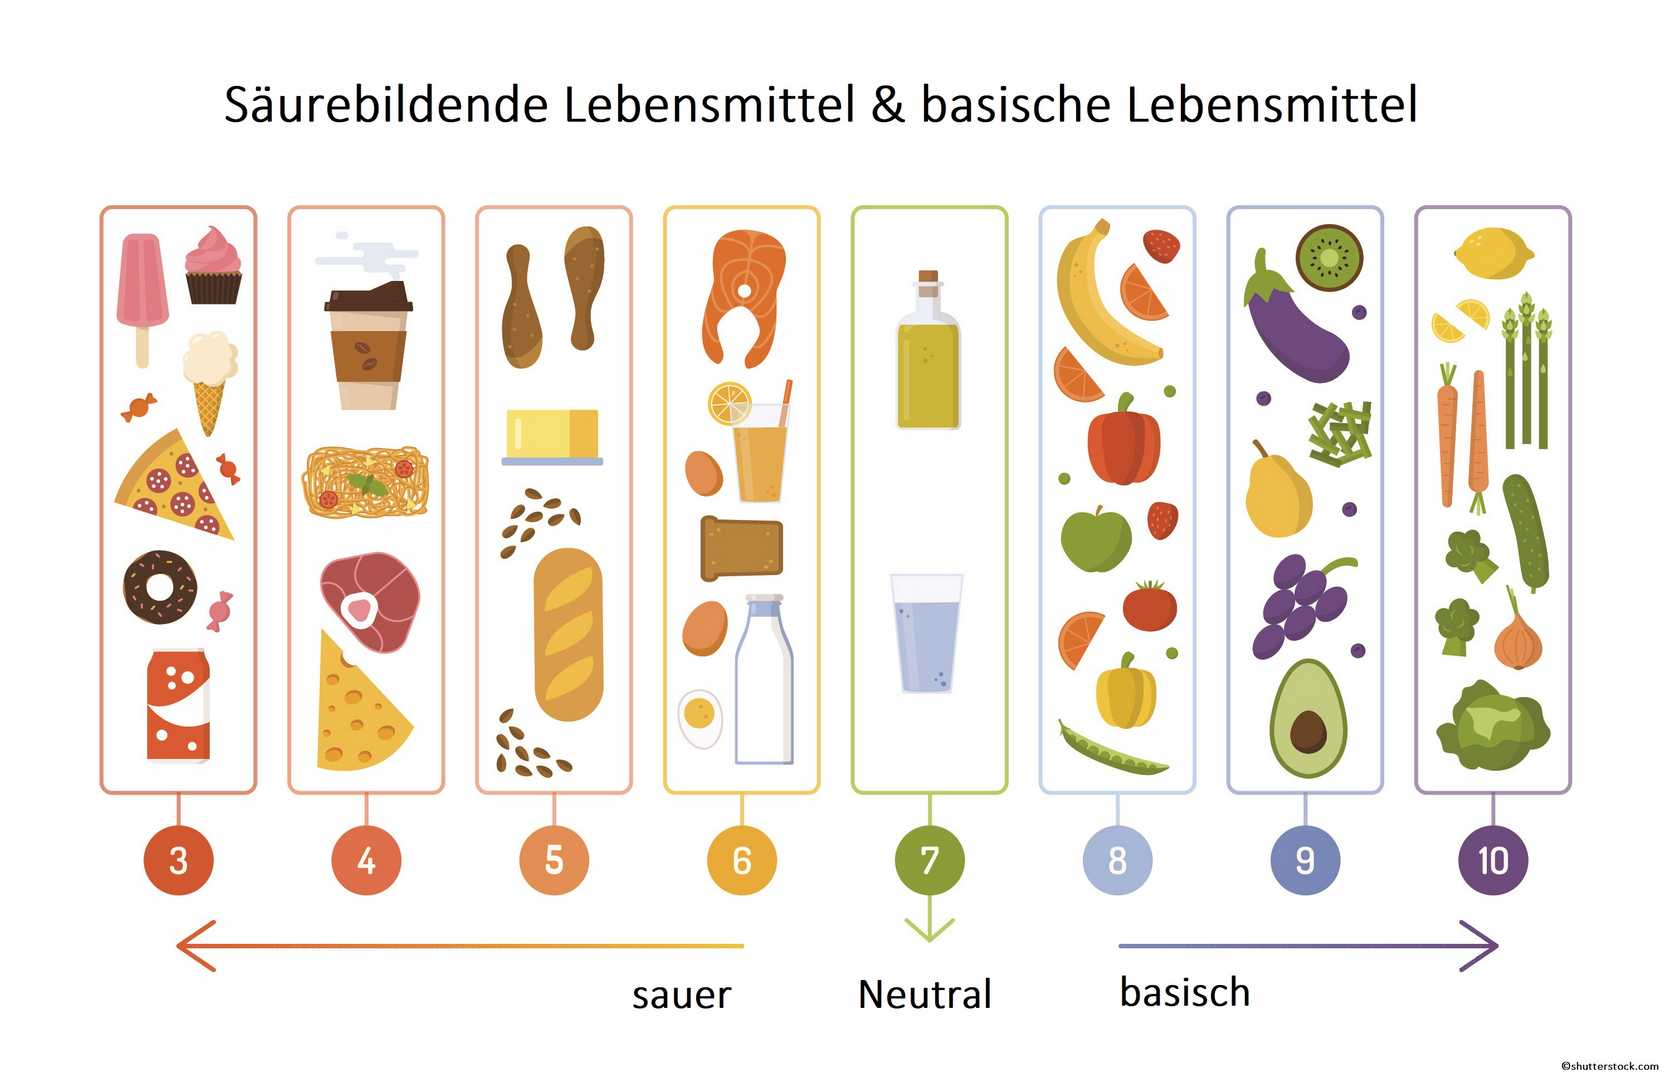 Säure-Basen-Haushalt ph-Wert Tabelle Säuren Basen Lebensmittel